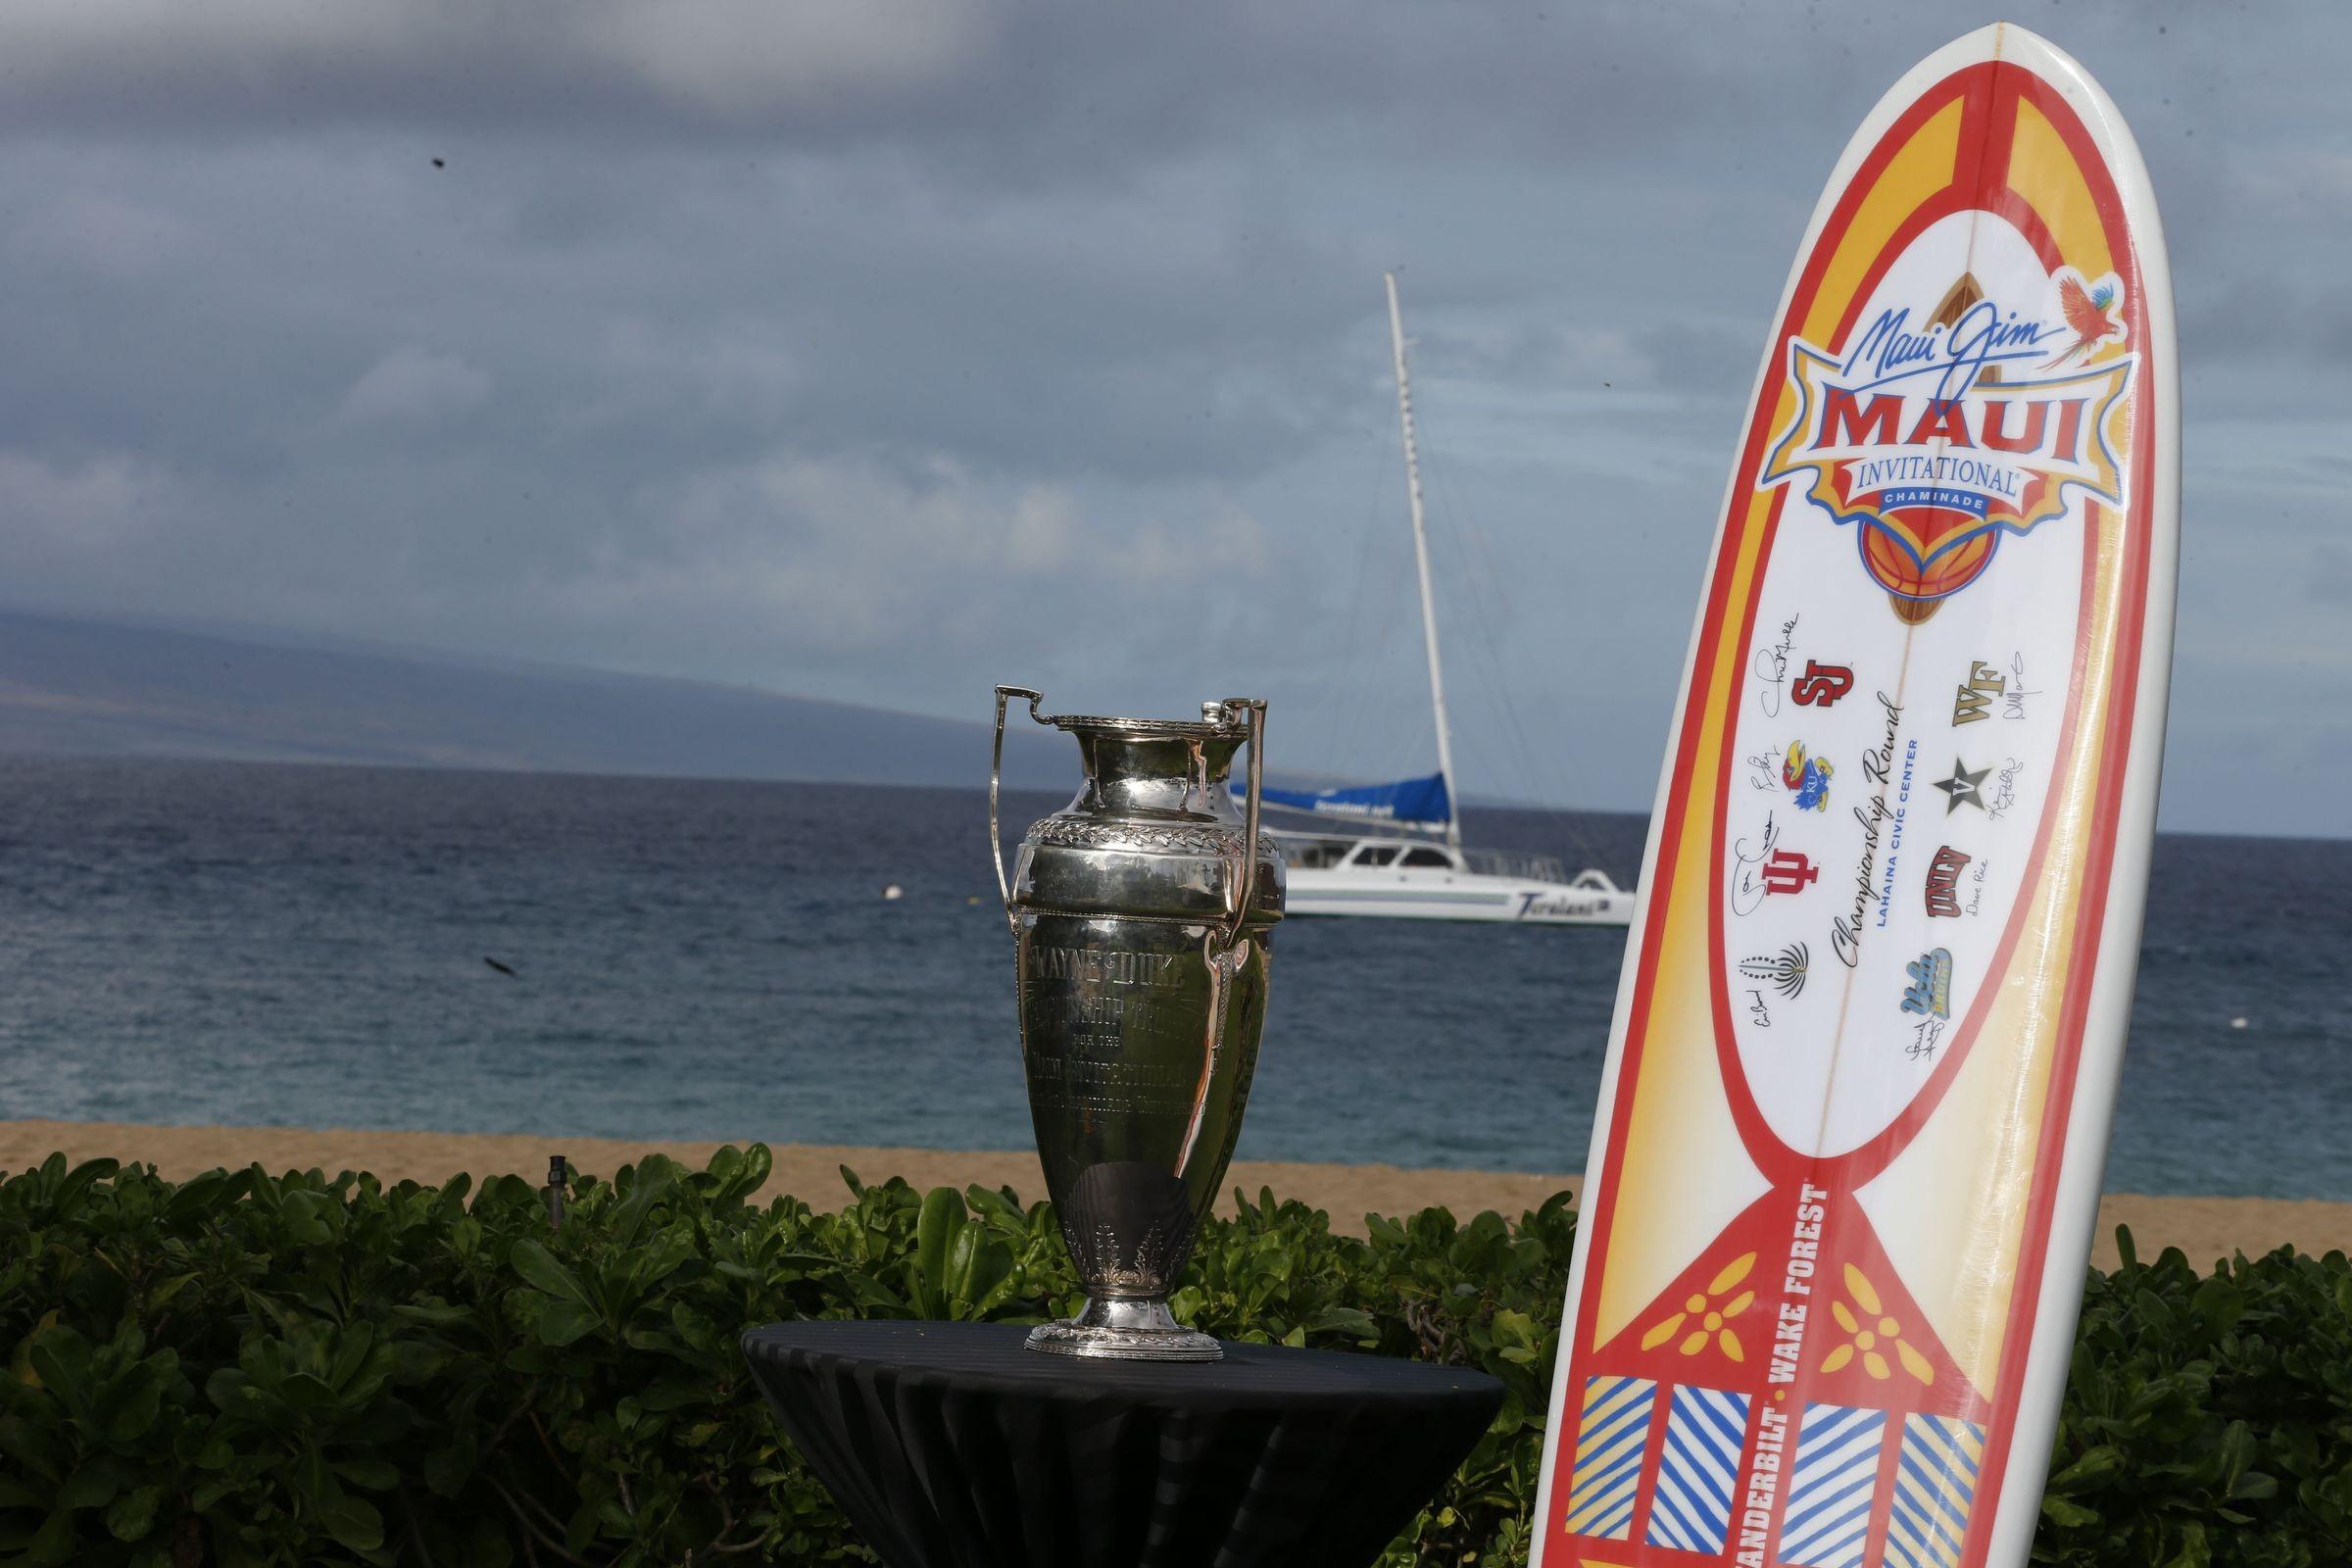 Maui Invitational Schedule with great invitation ideas